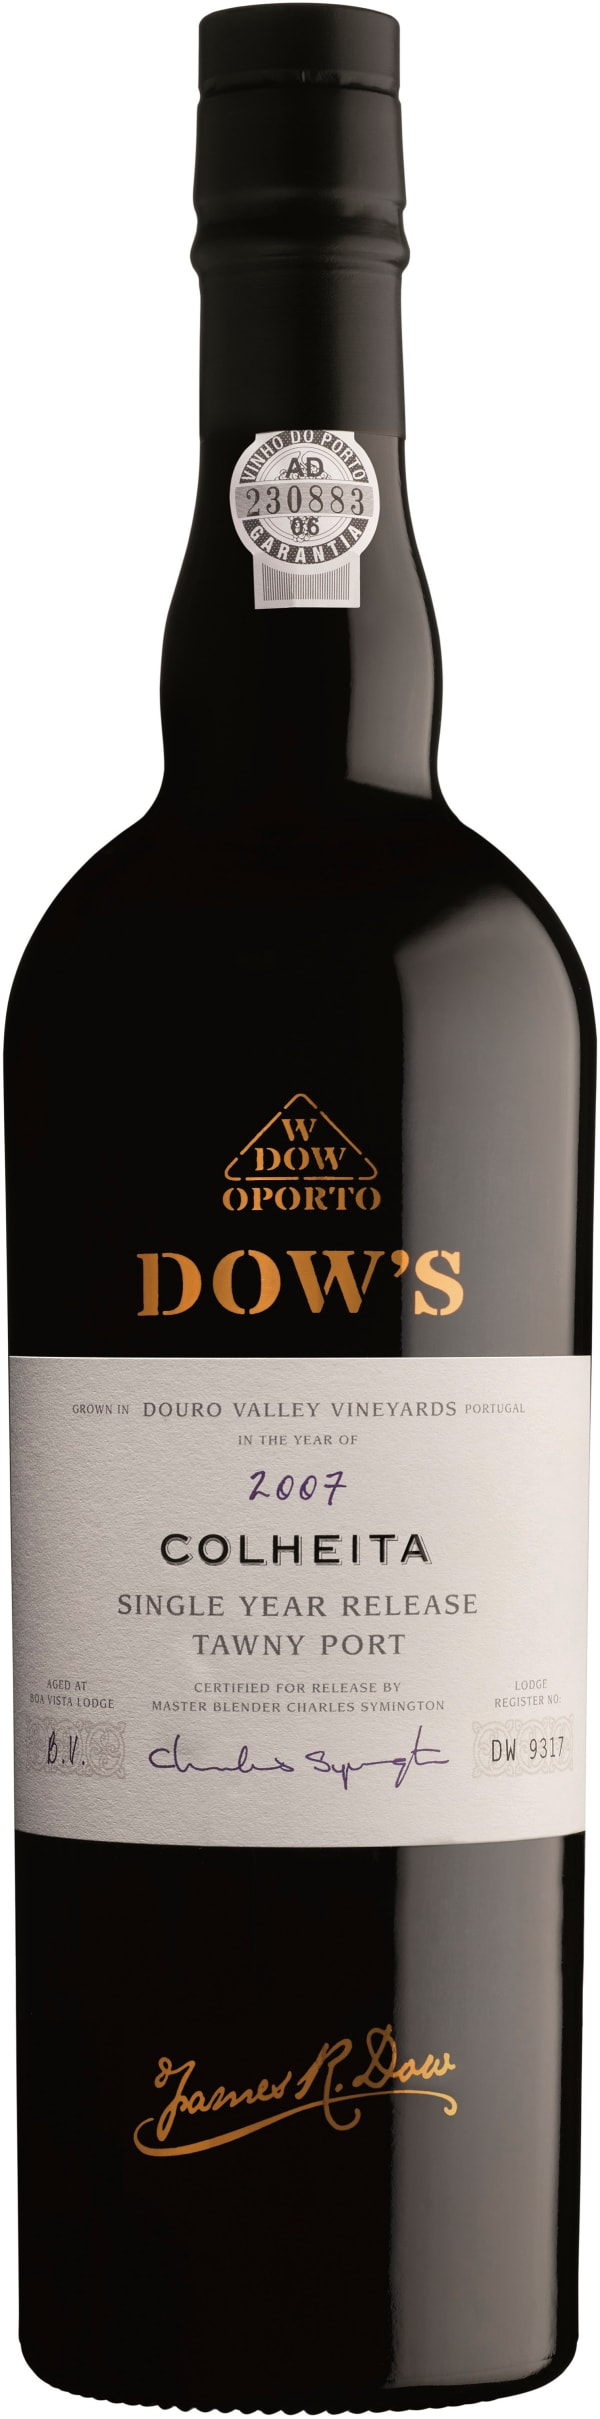 Dow's Colheita Single Harvest Tawny Port 2002